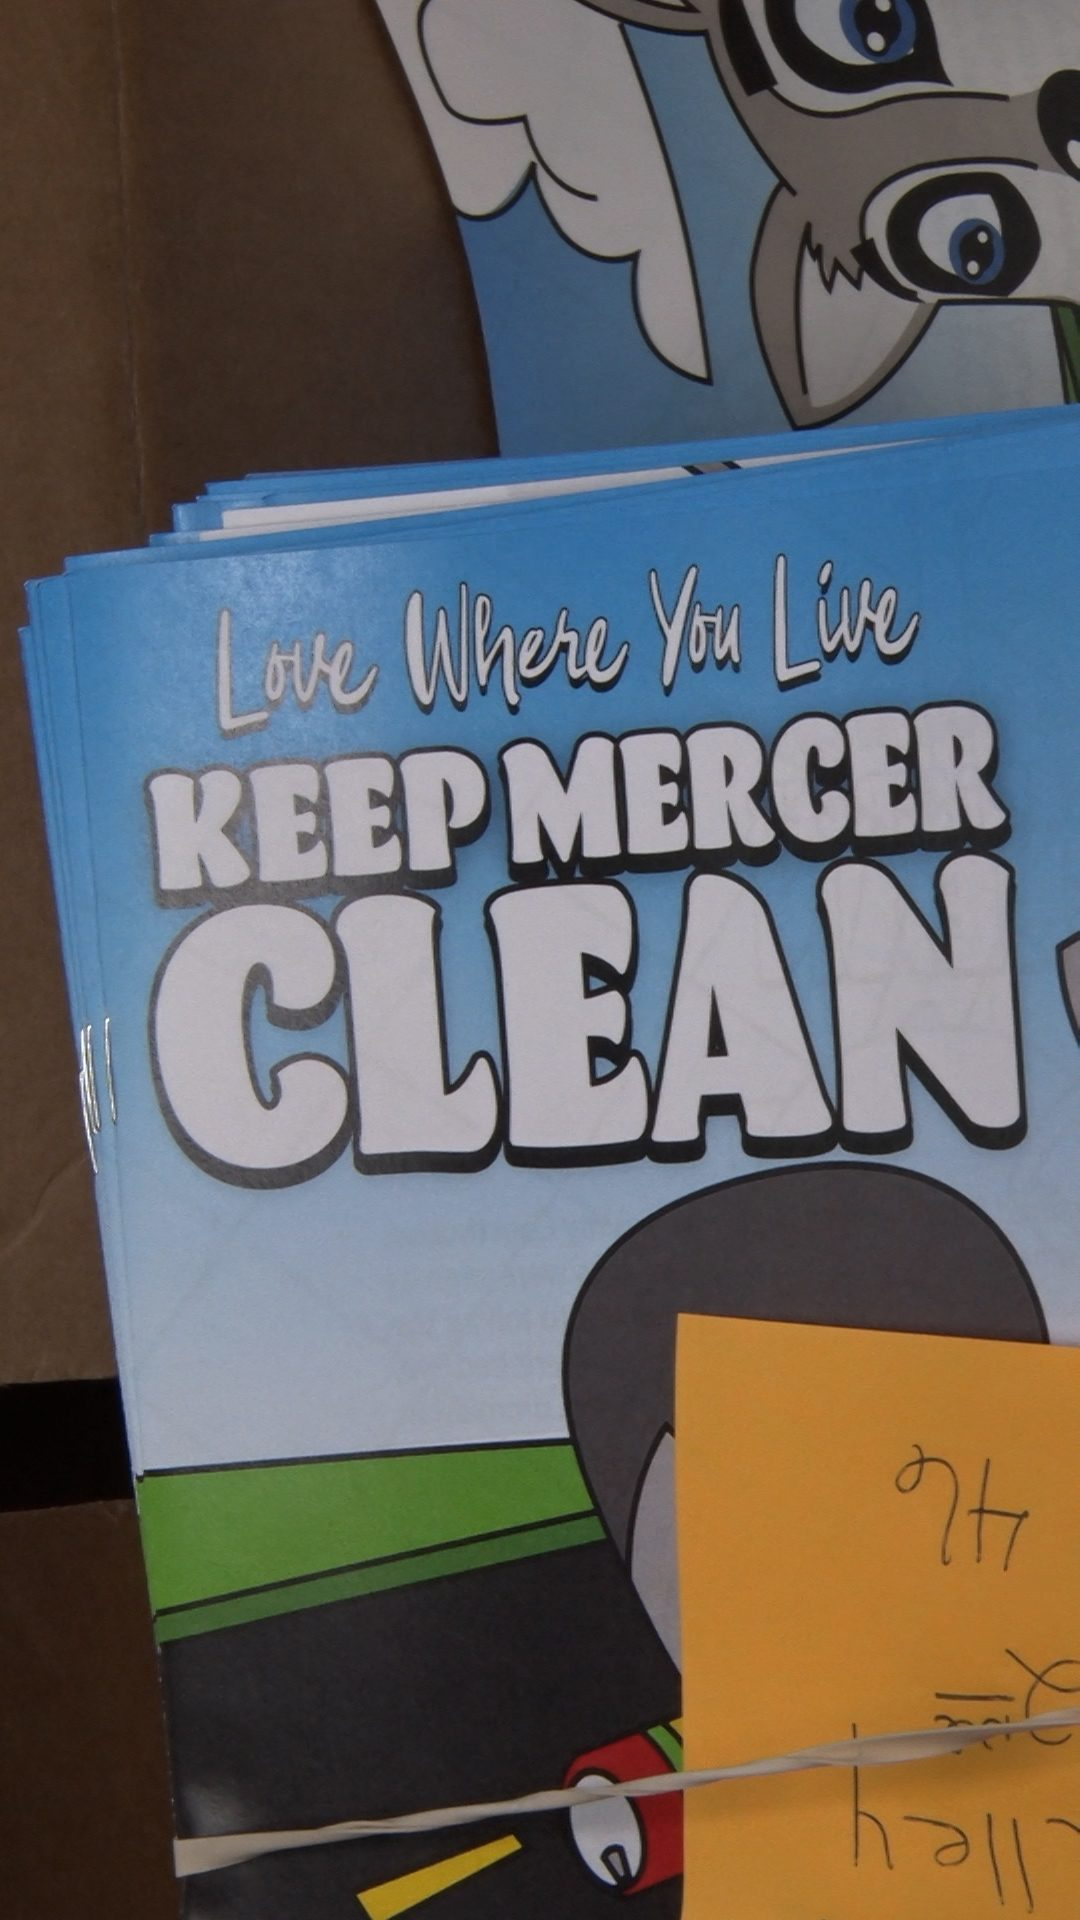 KEEP MERCER CLEAN SOTVO 00 00 30 15 Still001 e1615586132430 jpg?w=1280.